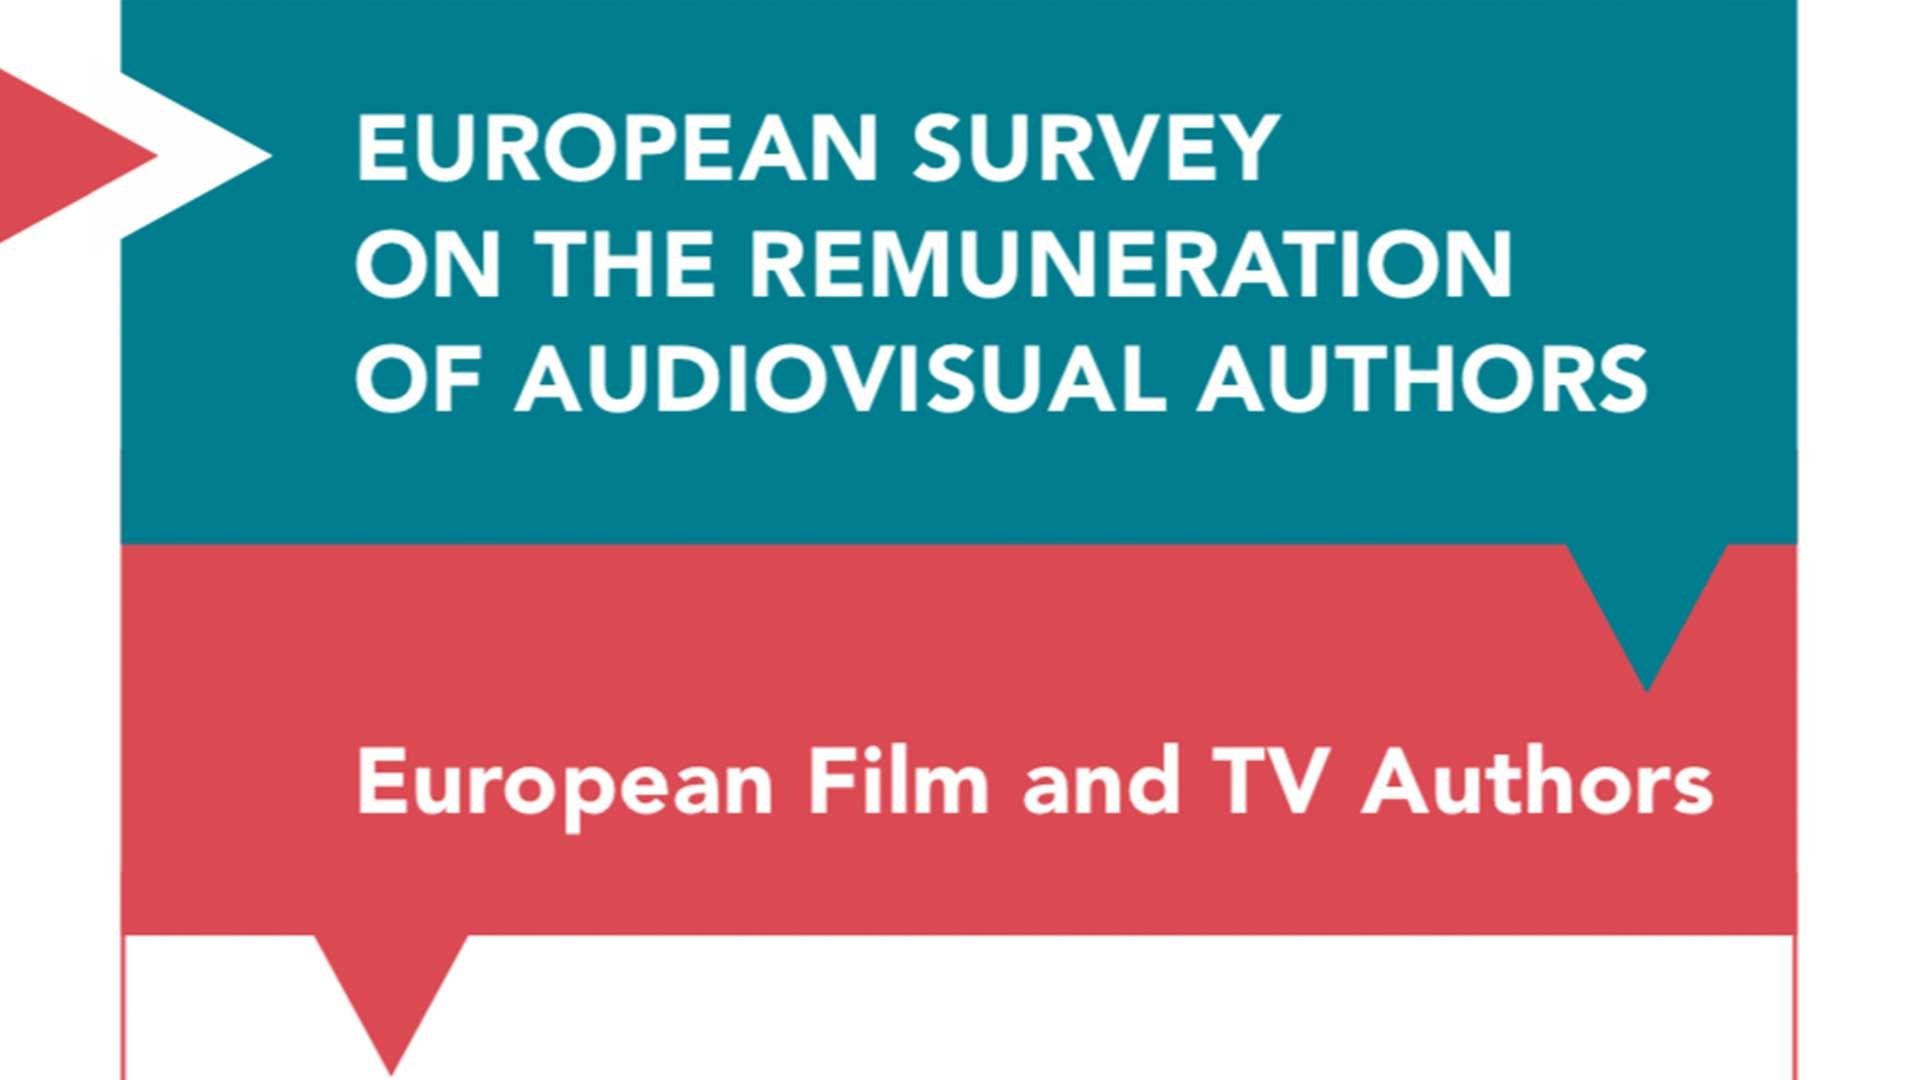 Fairness Rocks News EUROPEAN SURVEY ON THE REMUNERATION OF AUDIOVISUAL AUTHORS